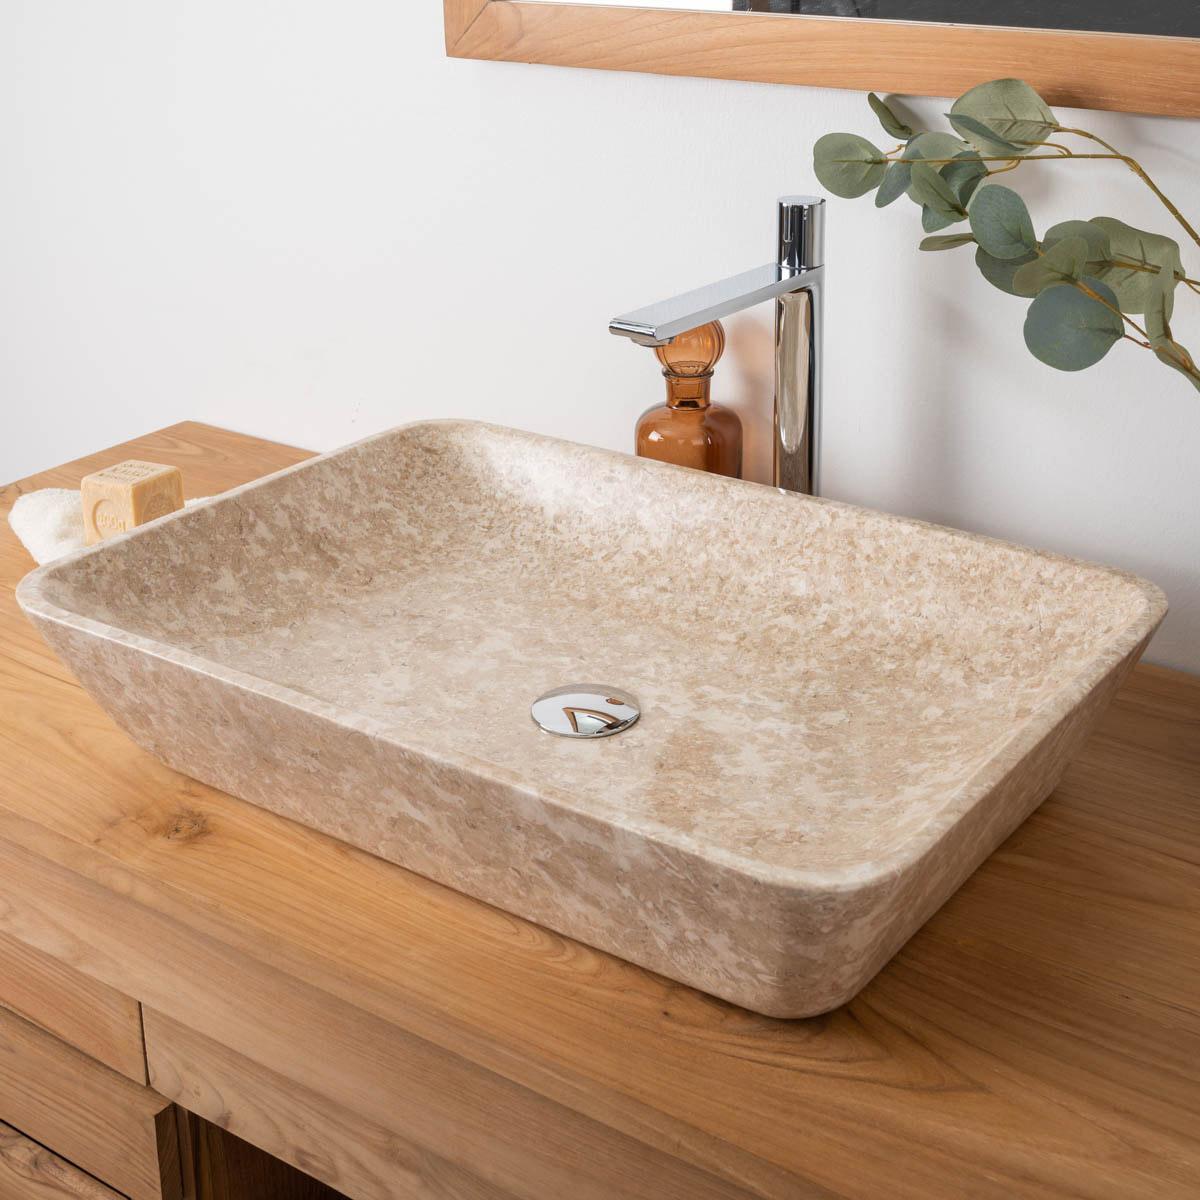 vasque de salle de bain en marbre carmen cr me 60cm meubles wanda collection. Black Bedroom Furniture Sets. Home Design Ideas